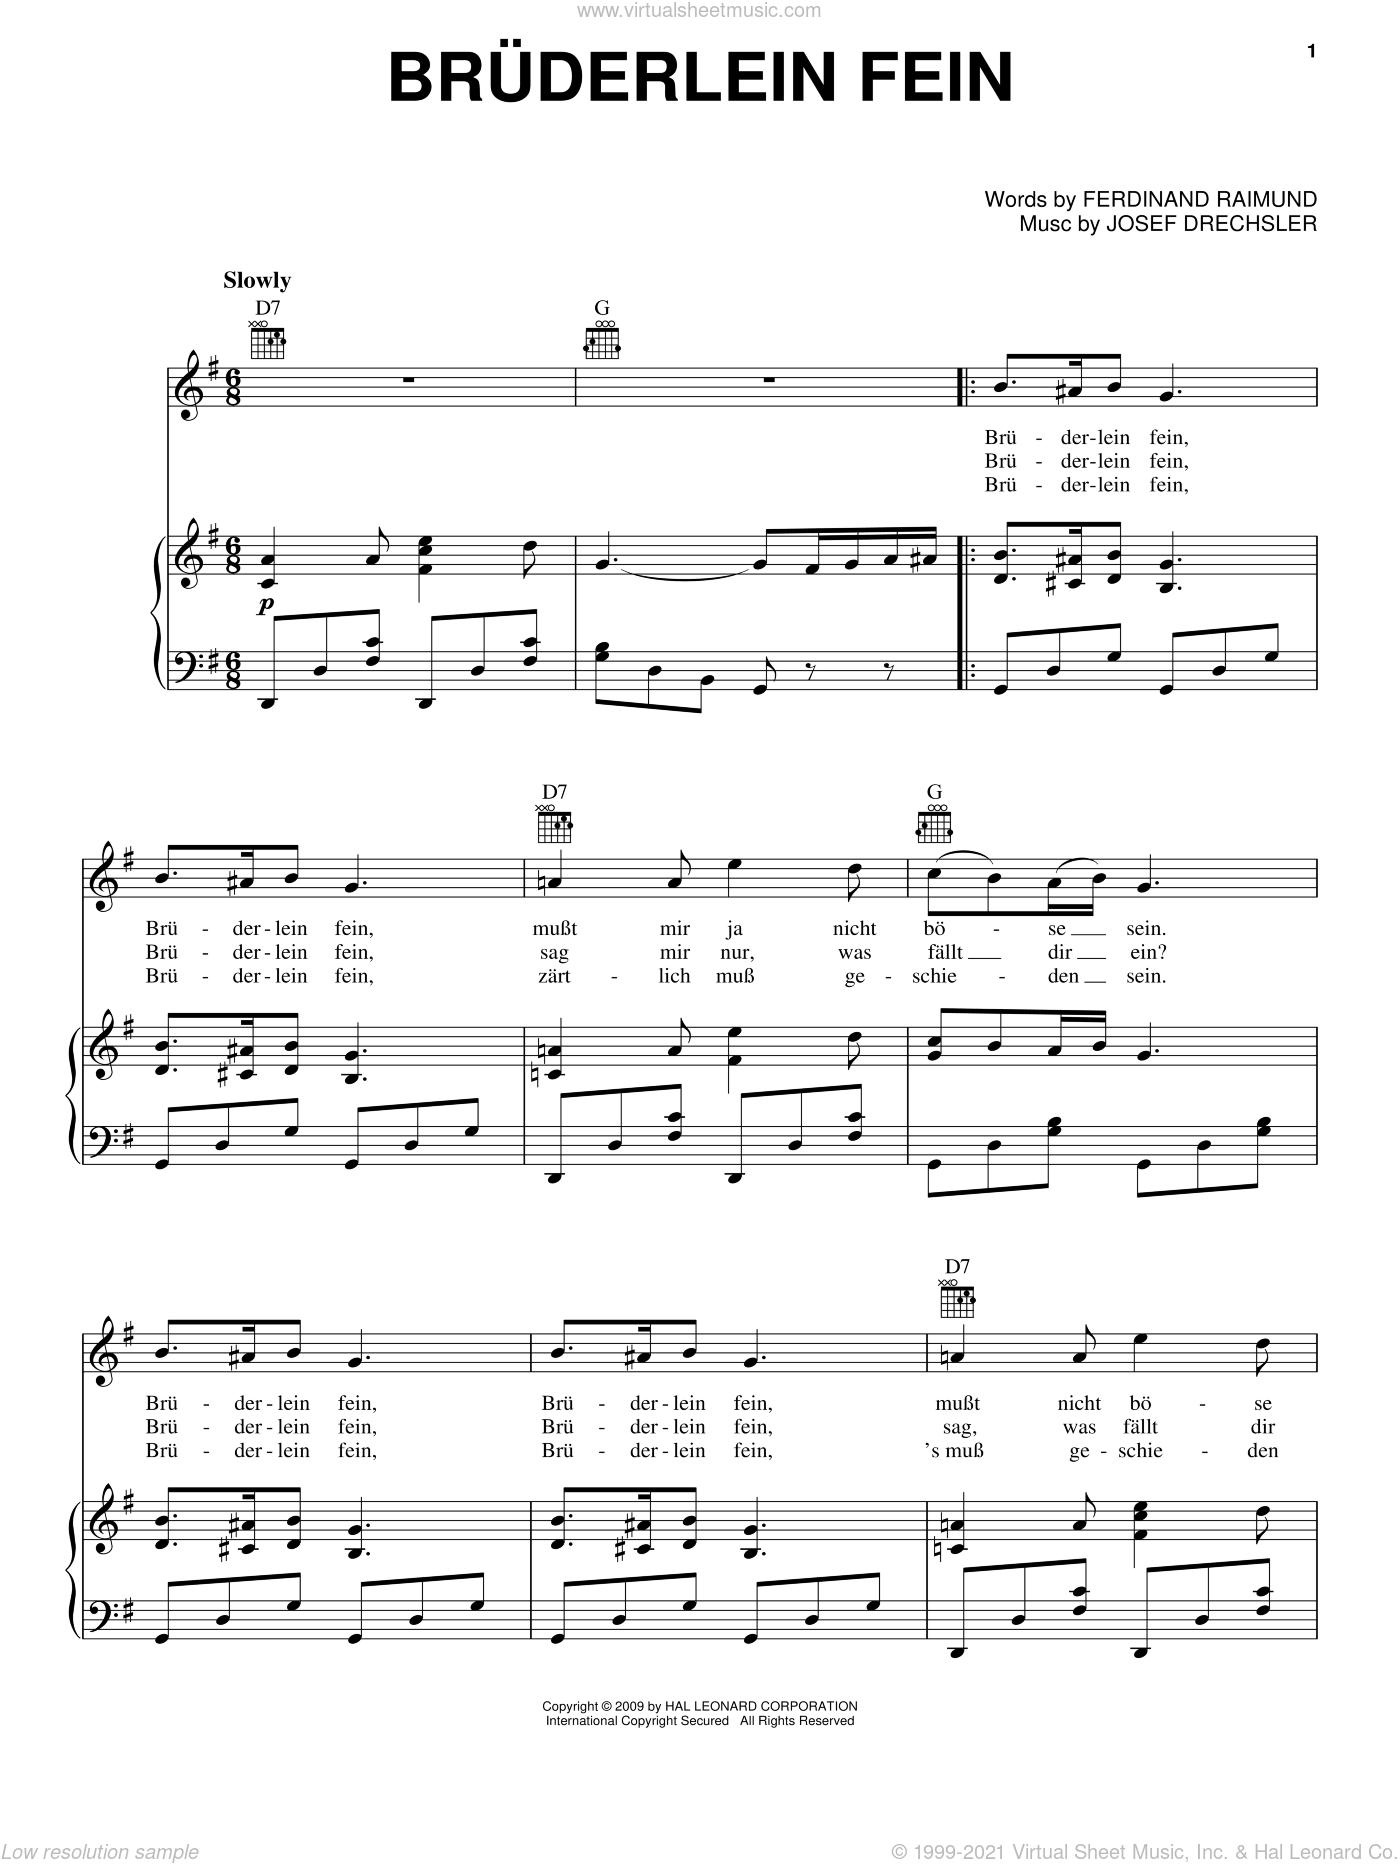 Bruderlein Fein sheet music for voice, piano or guitar by Ferdinand Raimund and Josef Drechler, intermediate skill level